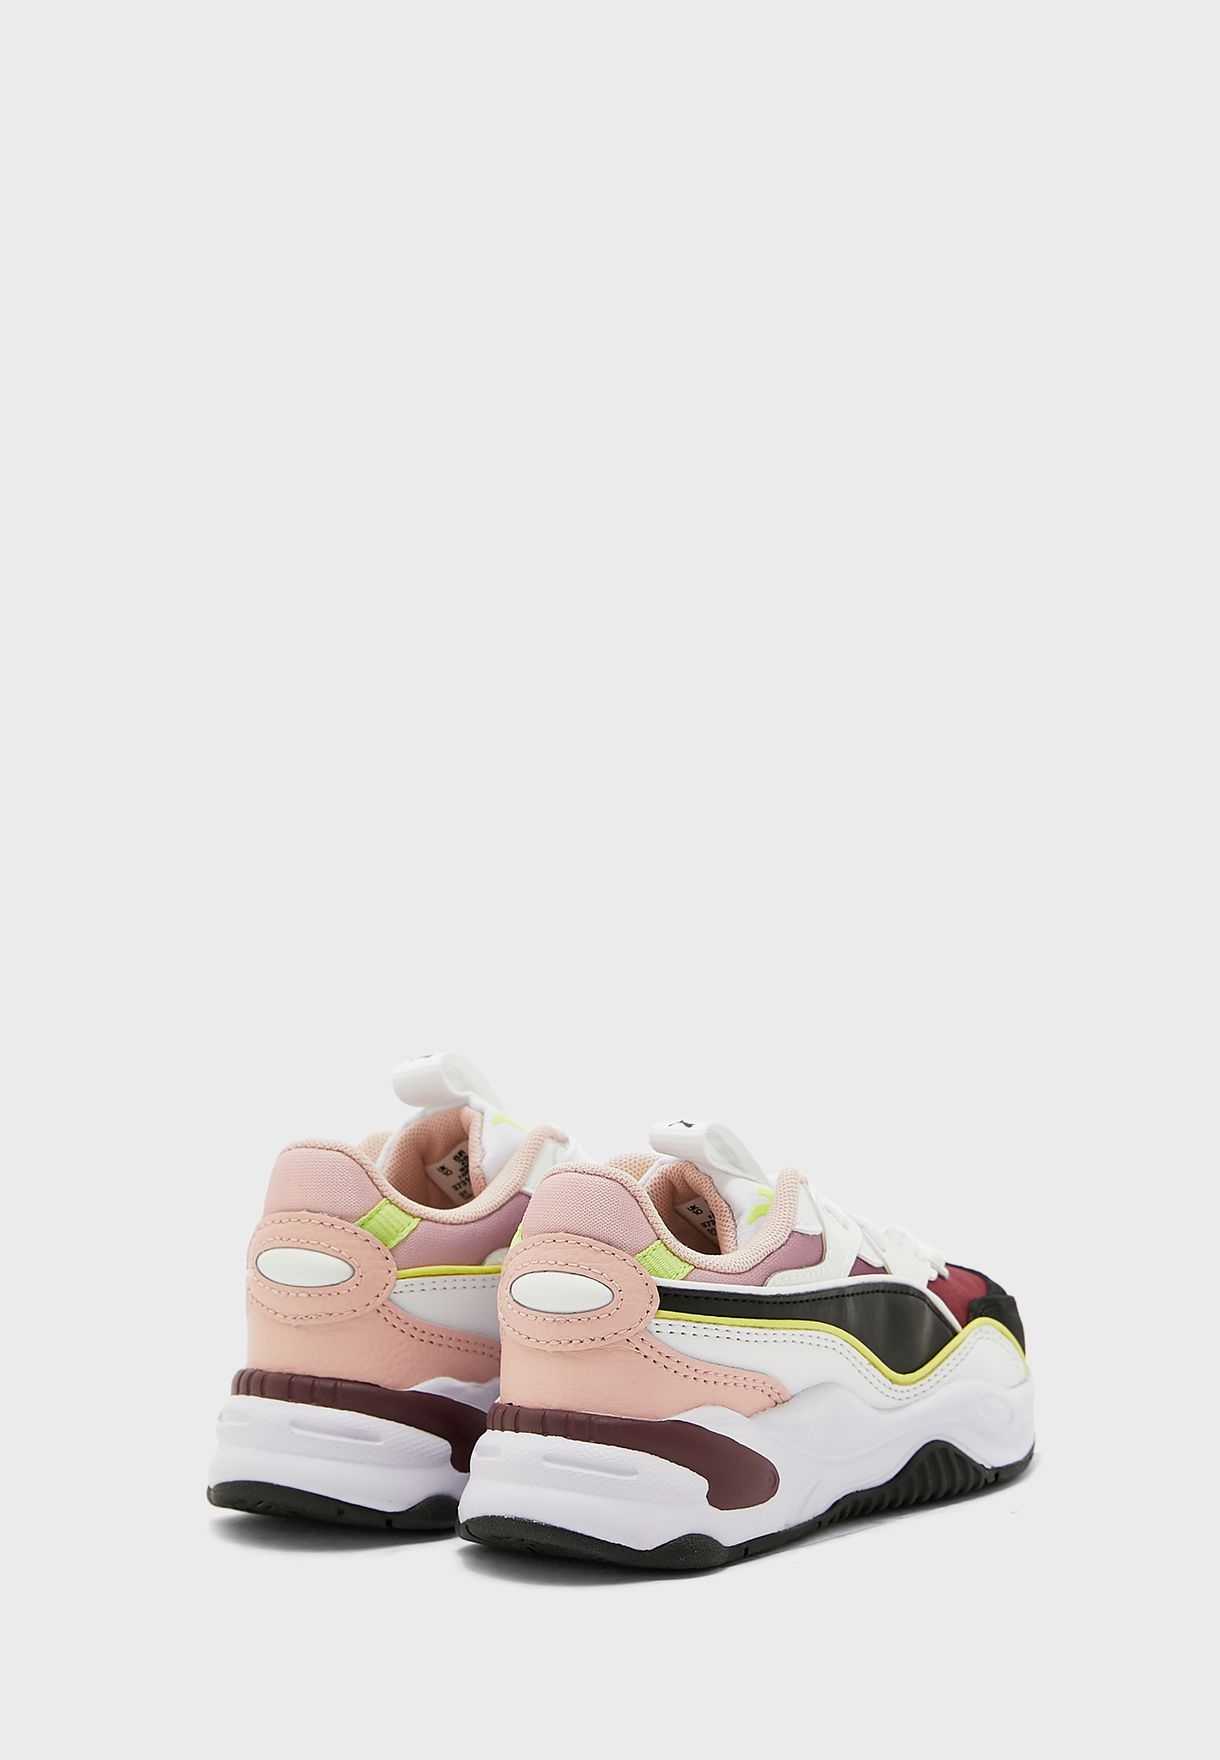 حذاء ار اس -2 كيه سبيس